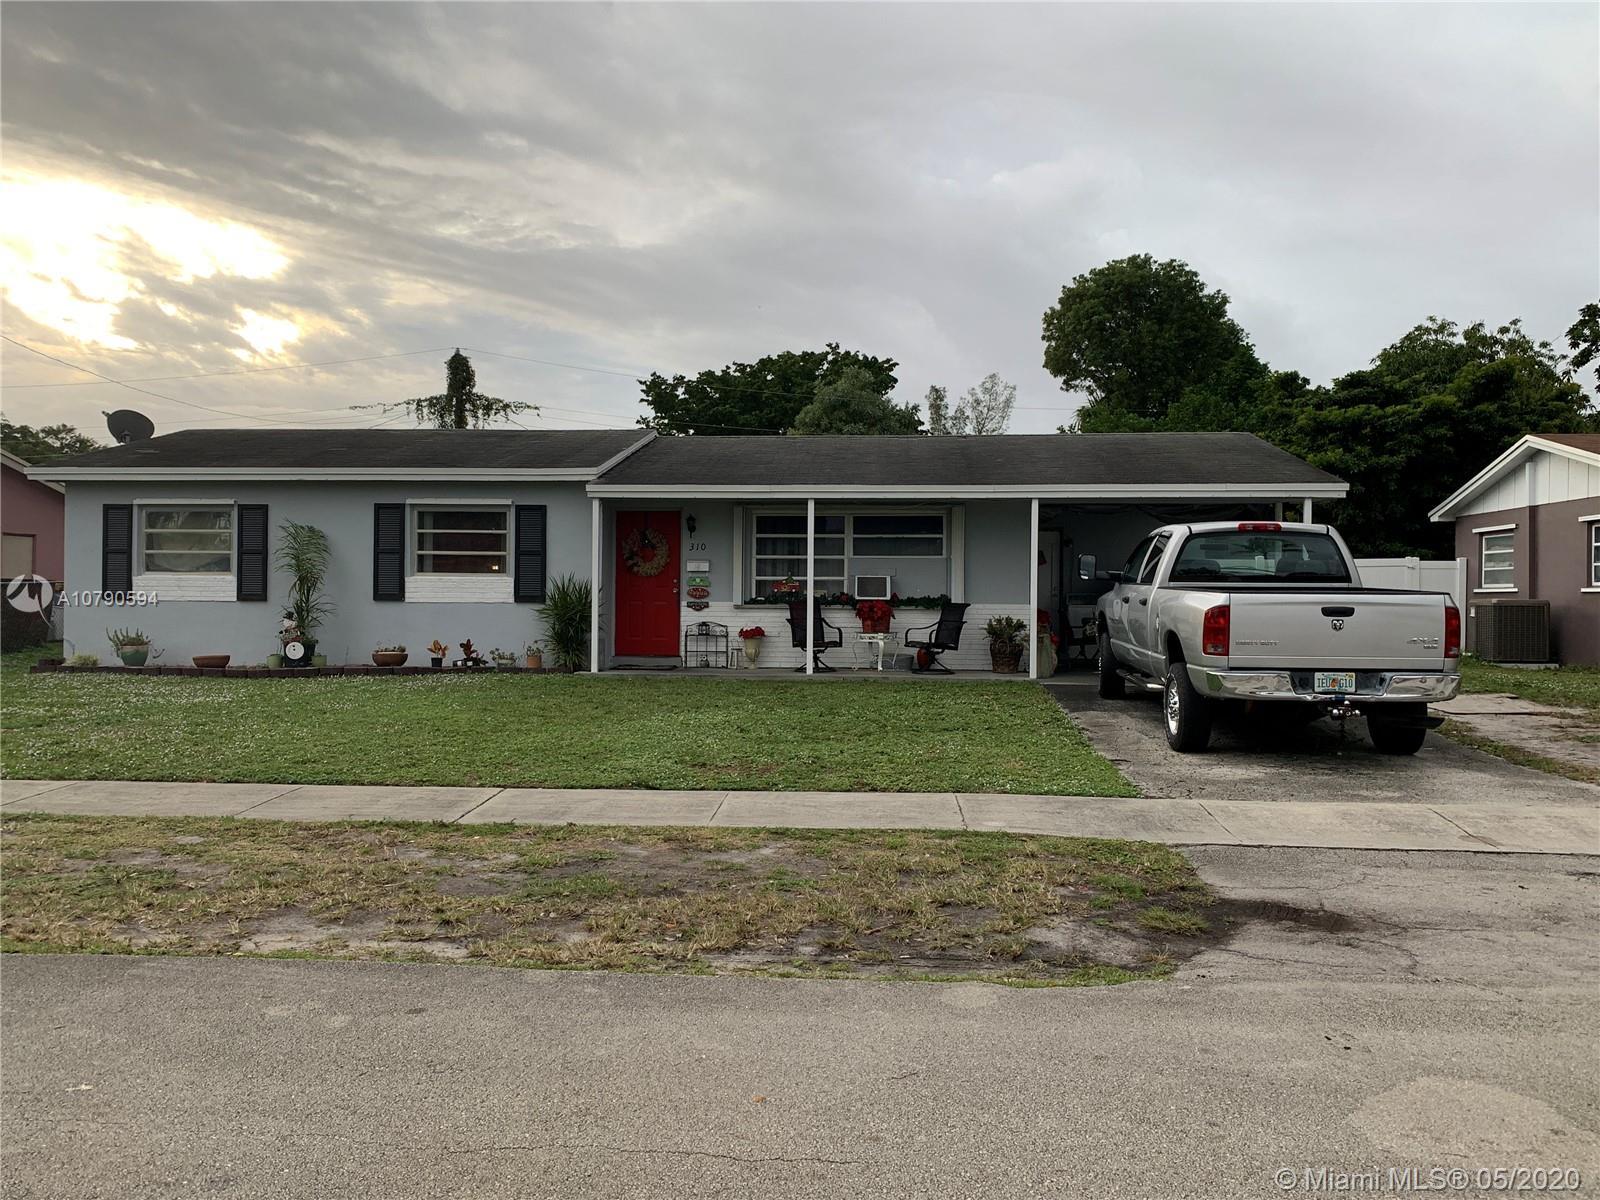 310 N 71st Ave, Hollywood, FL 33024 - Hollywood, FL real estate listing